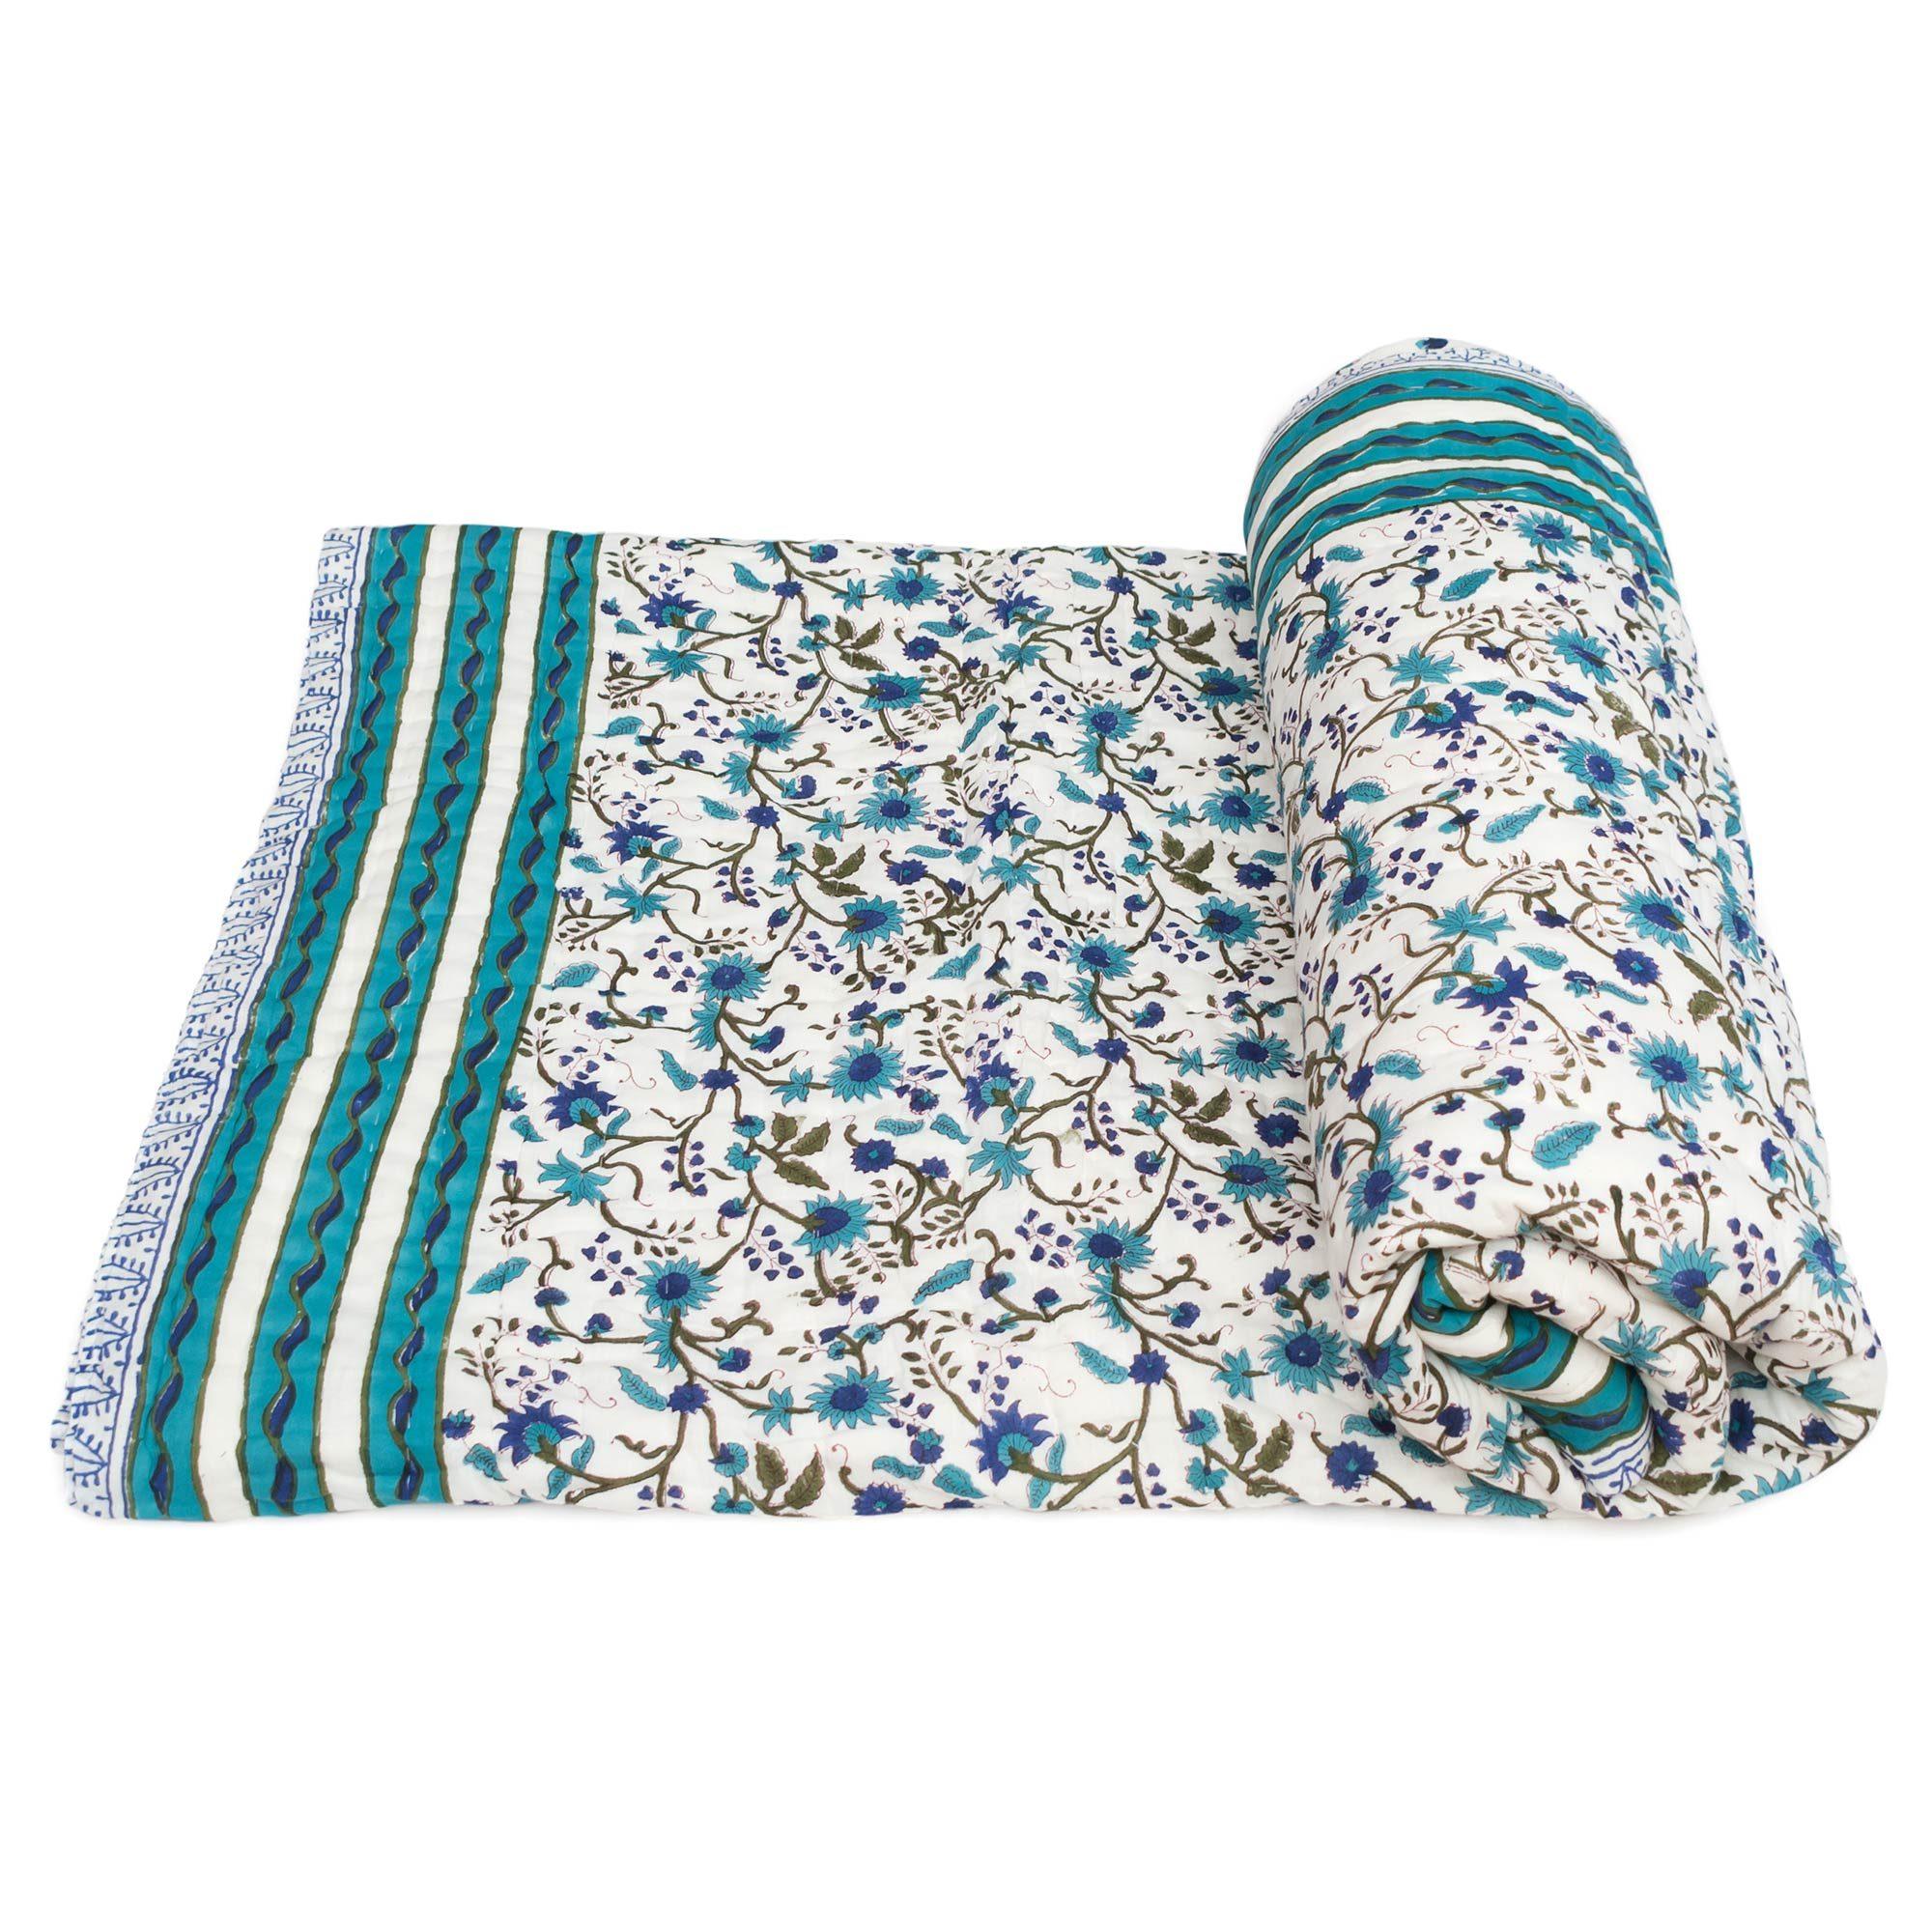 Tara-Textile - indische Decke - Leichte Decke Dhara